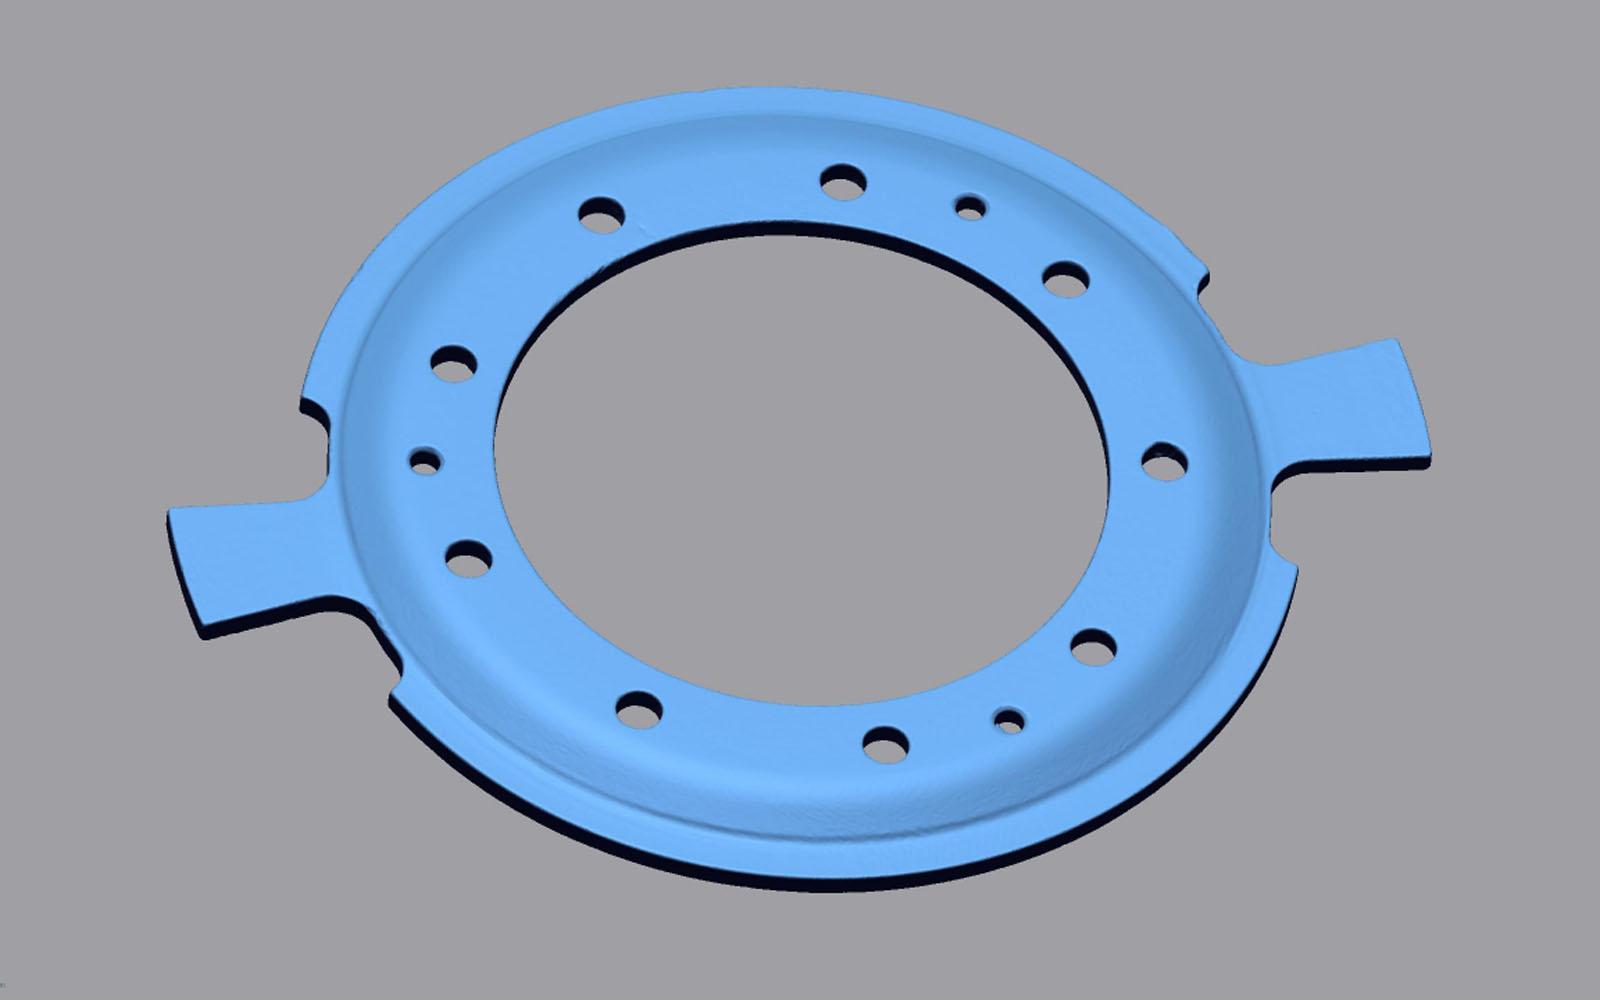 Conap 3D Reverse Engineering - Polygonflächenmodell eines Kupplungsrings